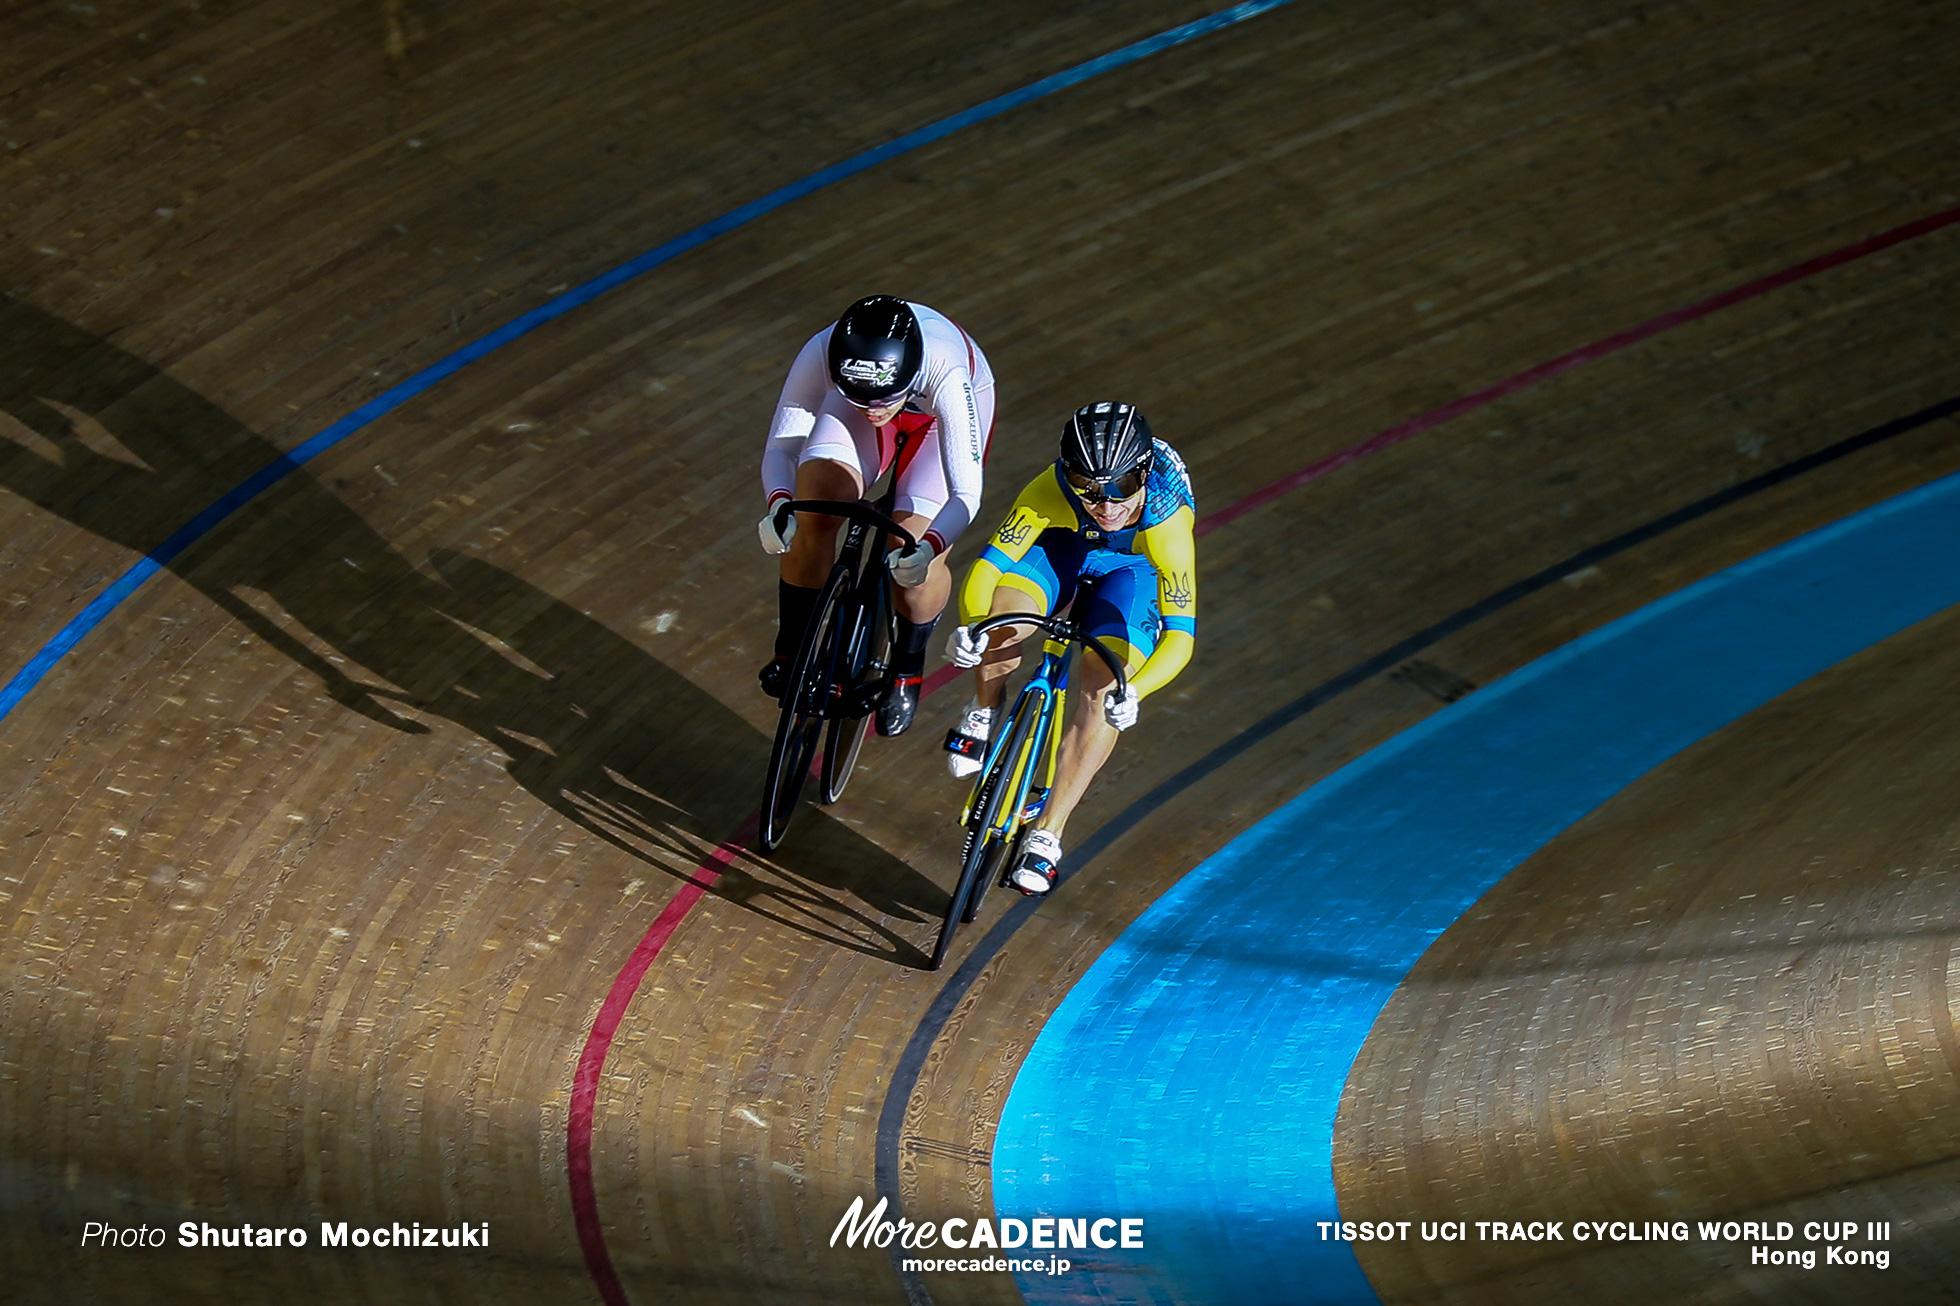 1/8 Finals / Women's Sprint / TISSOT UCI TRACK CYCLING WORLD CUP III, Hong Kong